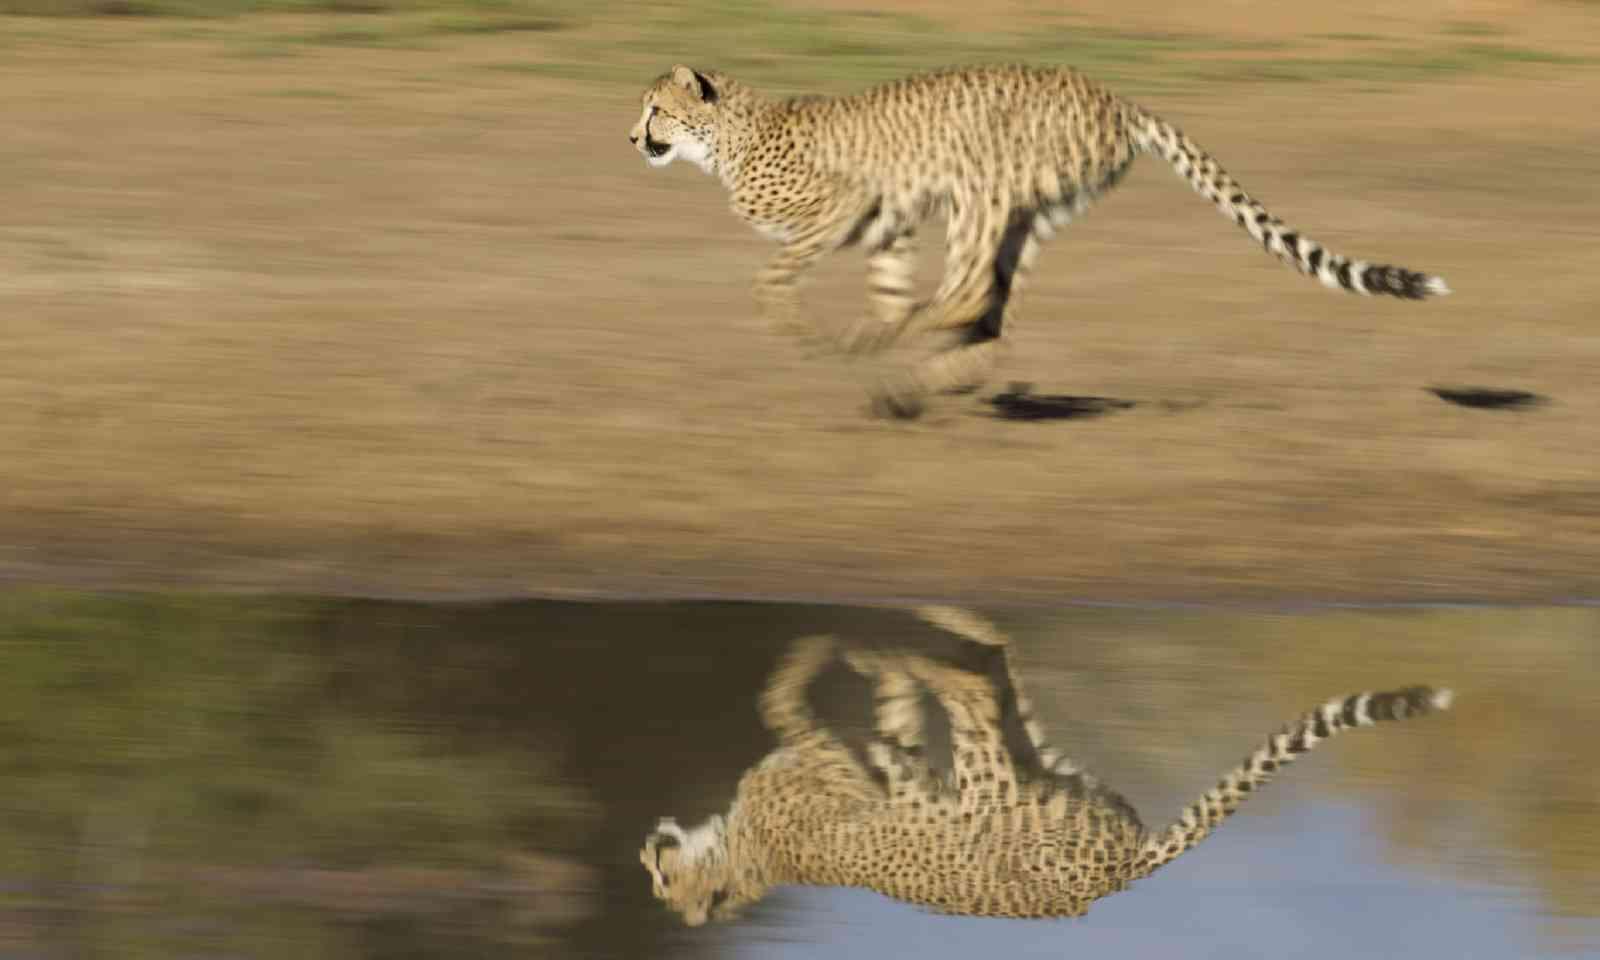 Cheetah running (Shutterstock)